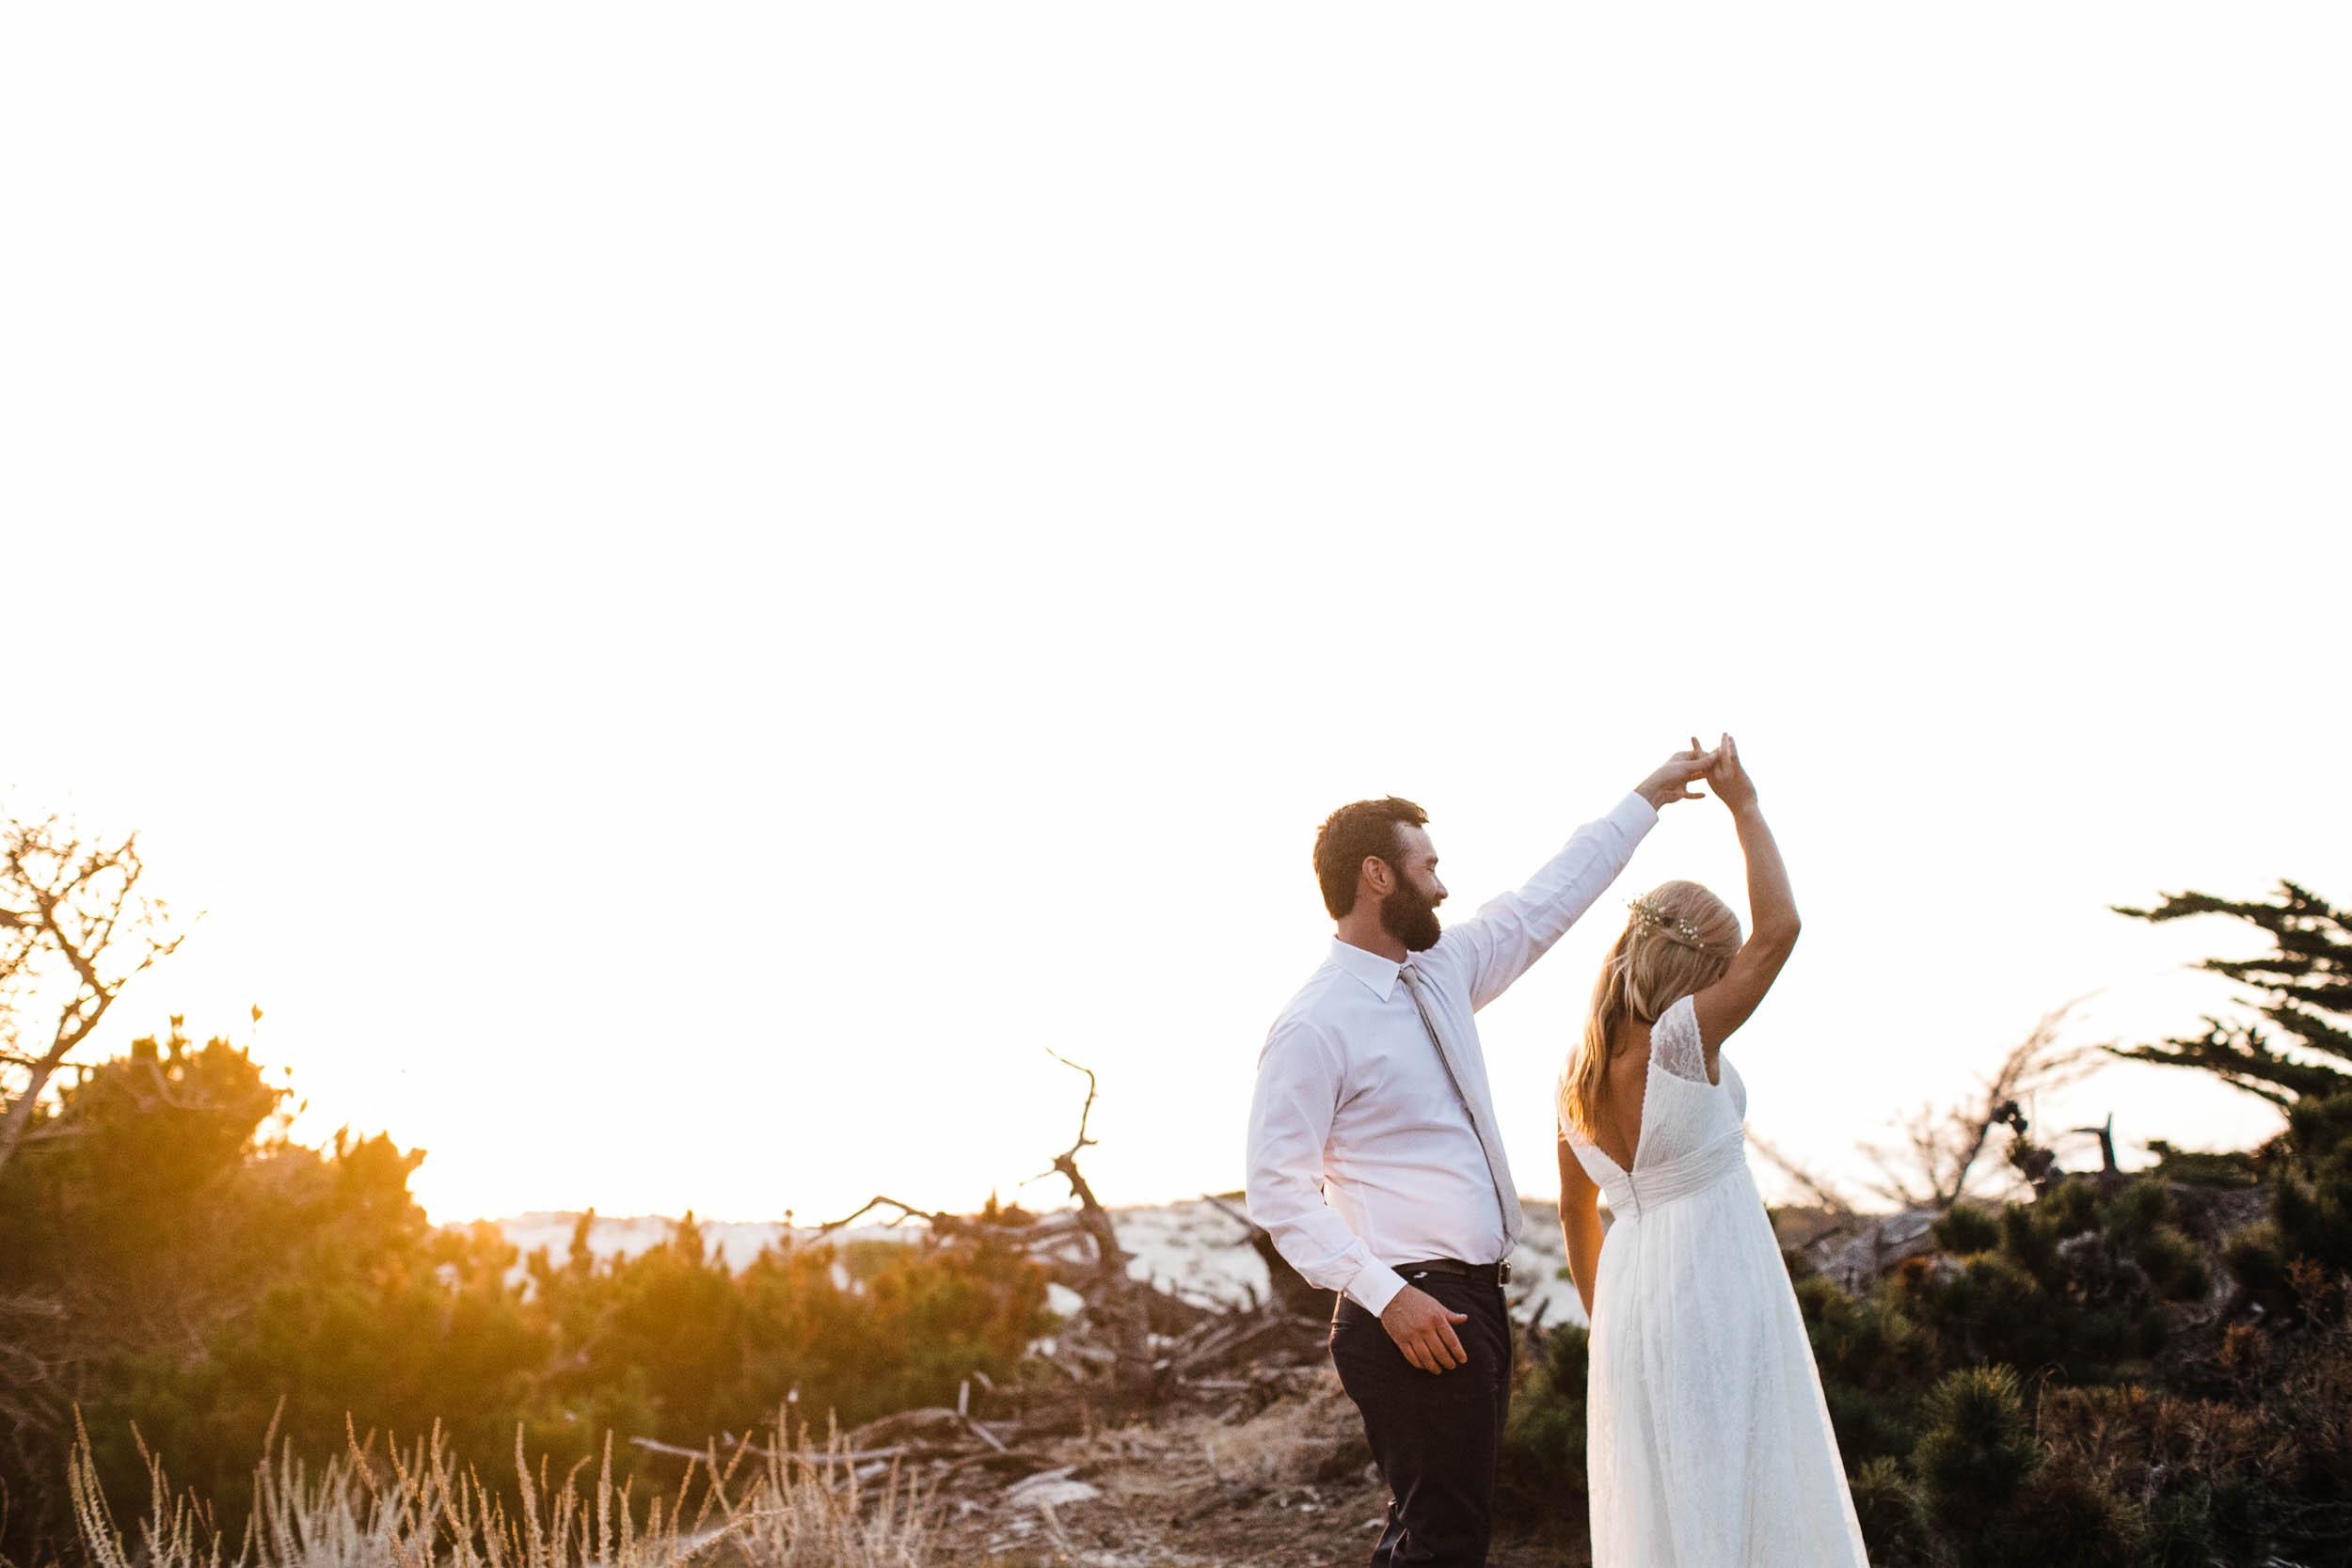 082617_C+K_Asilomar Pacific Grove Wedding_Buena Lane Photography_3074ER.jpg